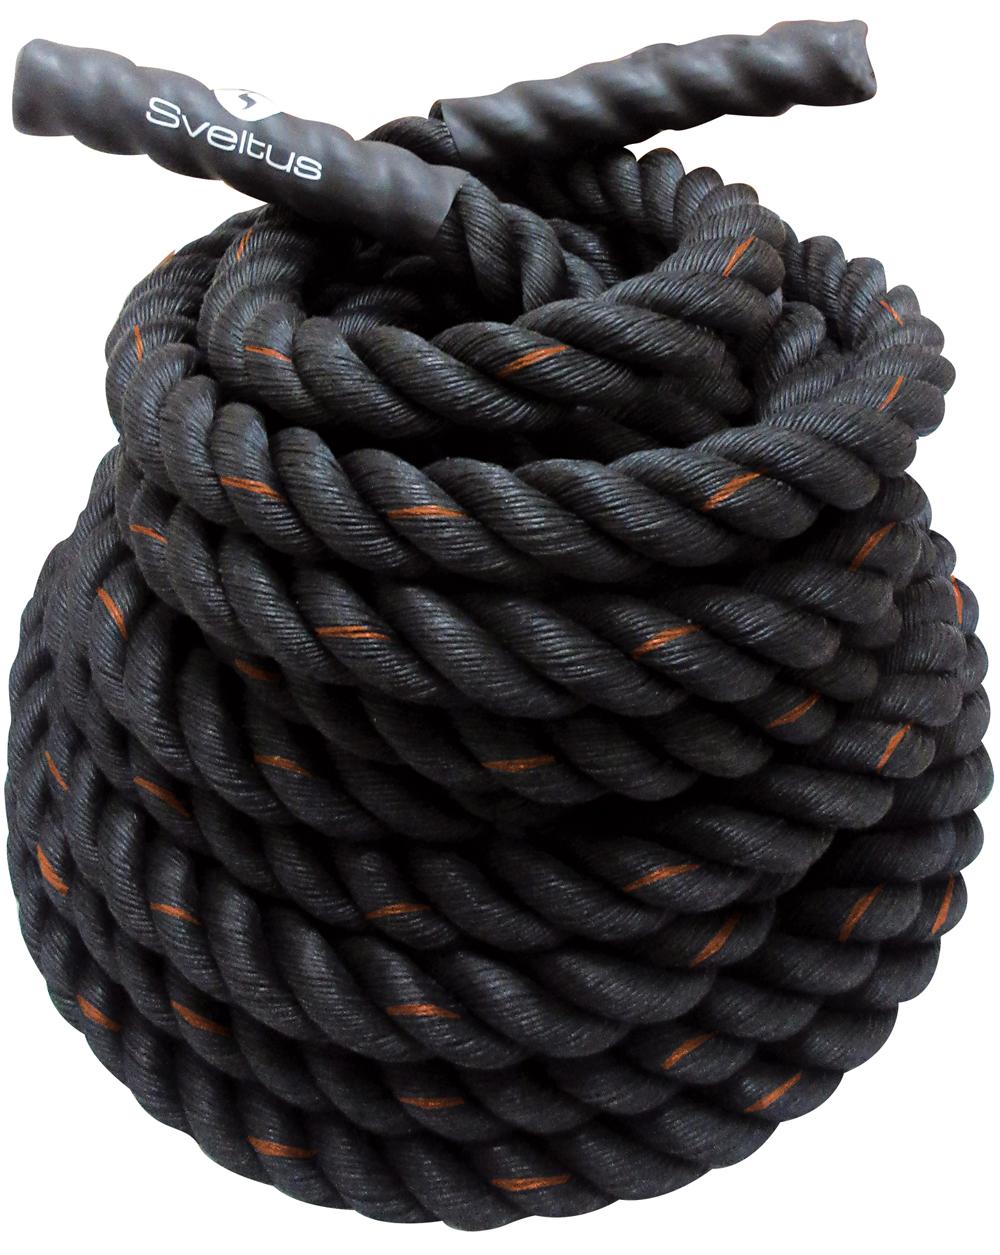 battle-rope-sveltus